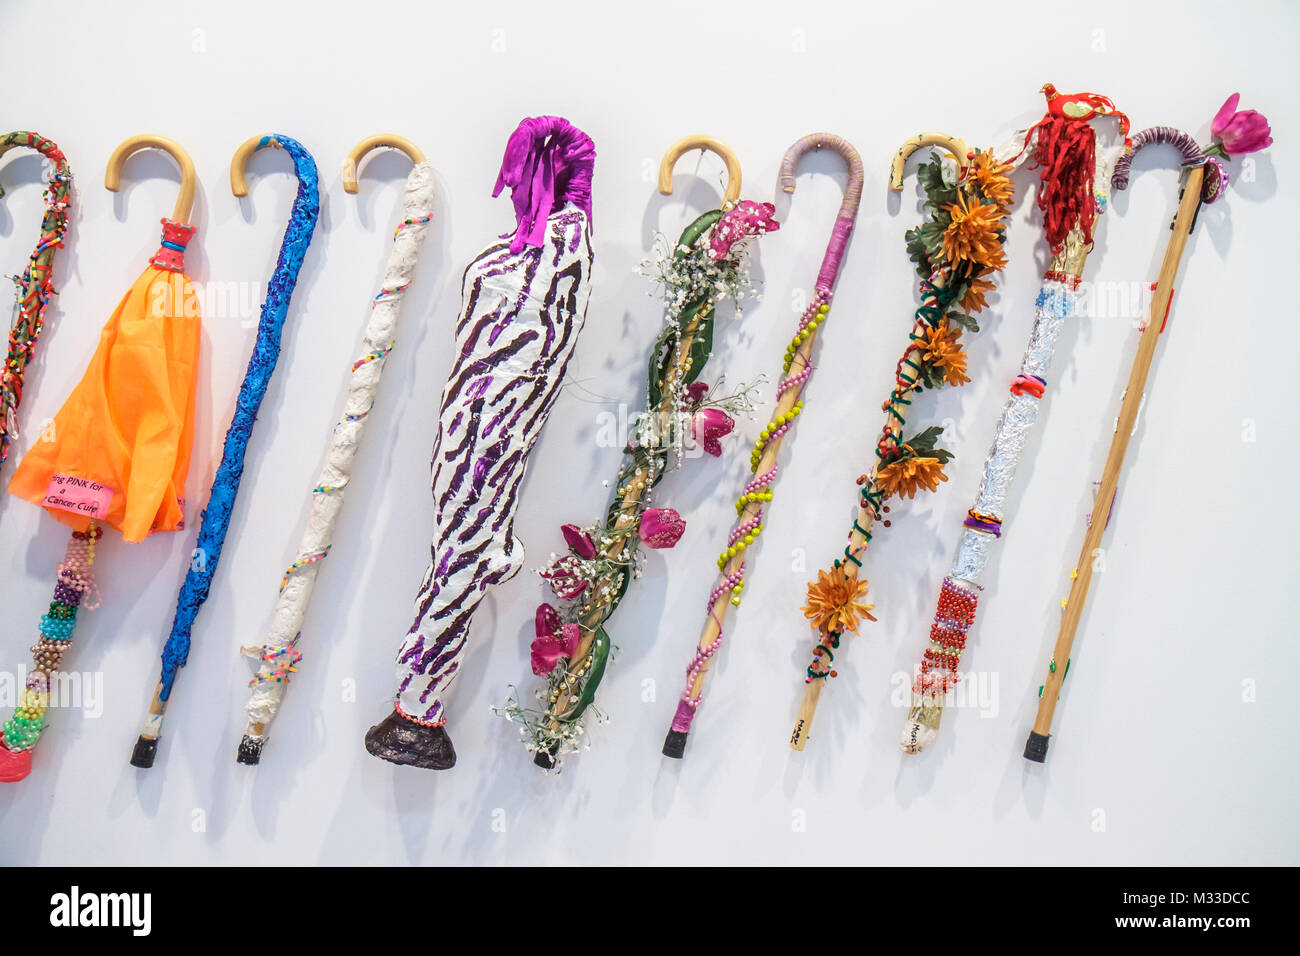 Philadelphia Pennsylvania Philadelphia Museum of Art education department walking stick cane artwork made by legally - Stock Image